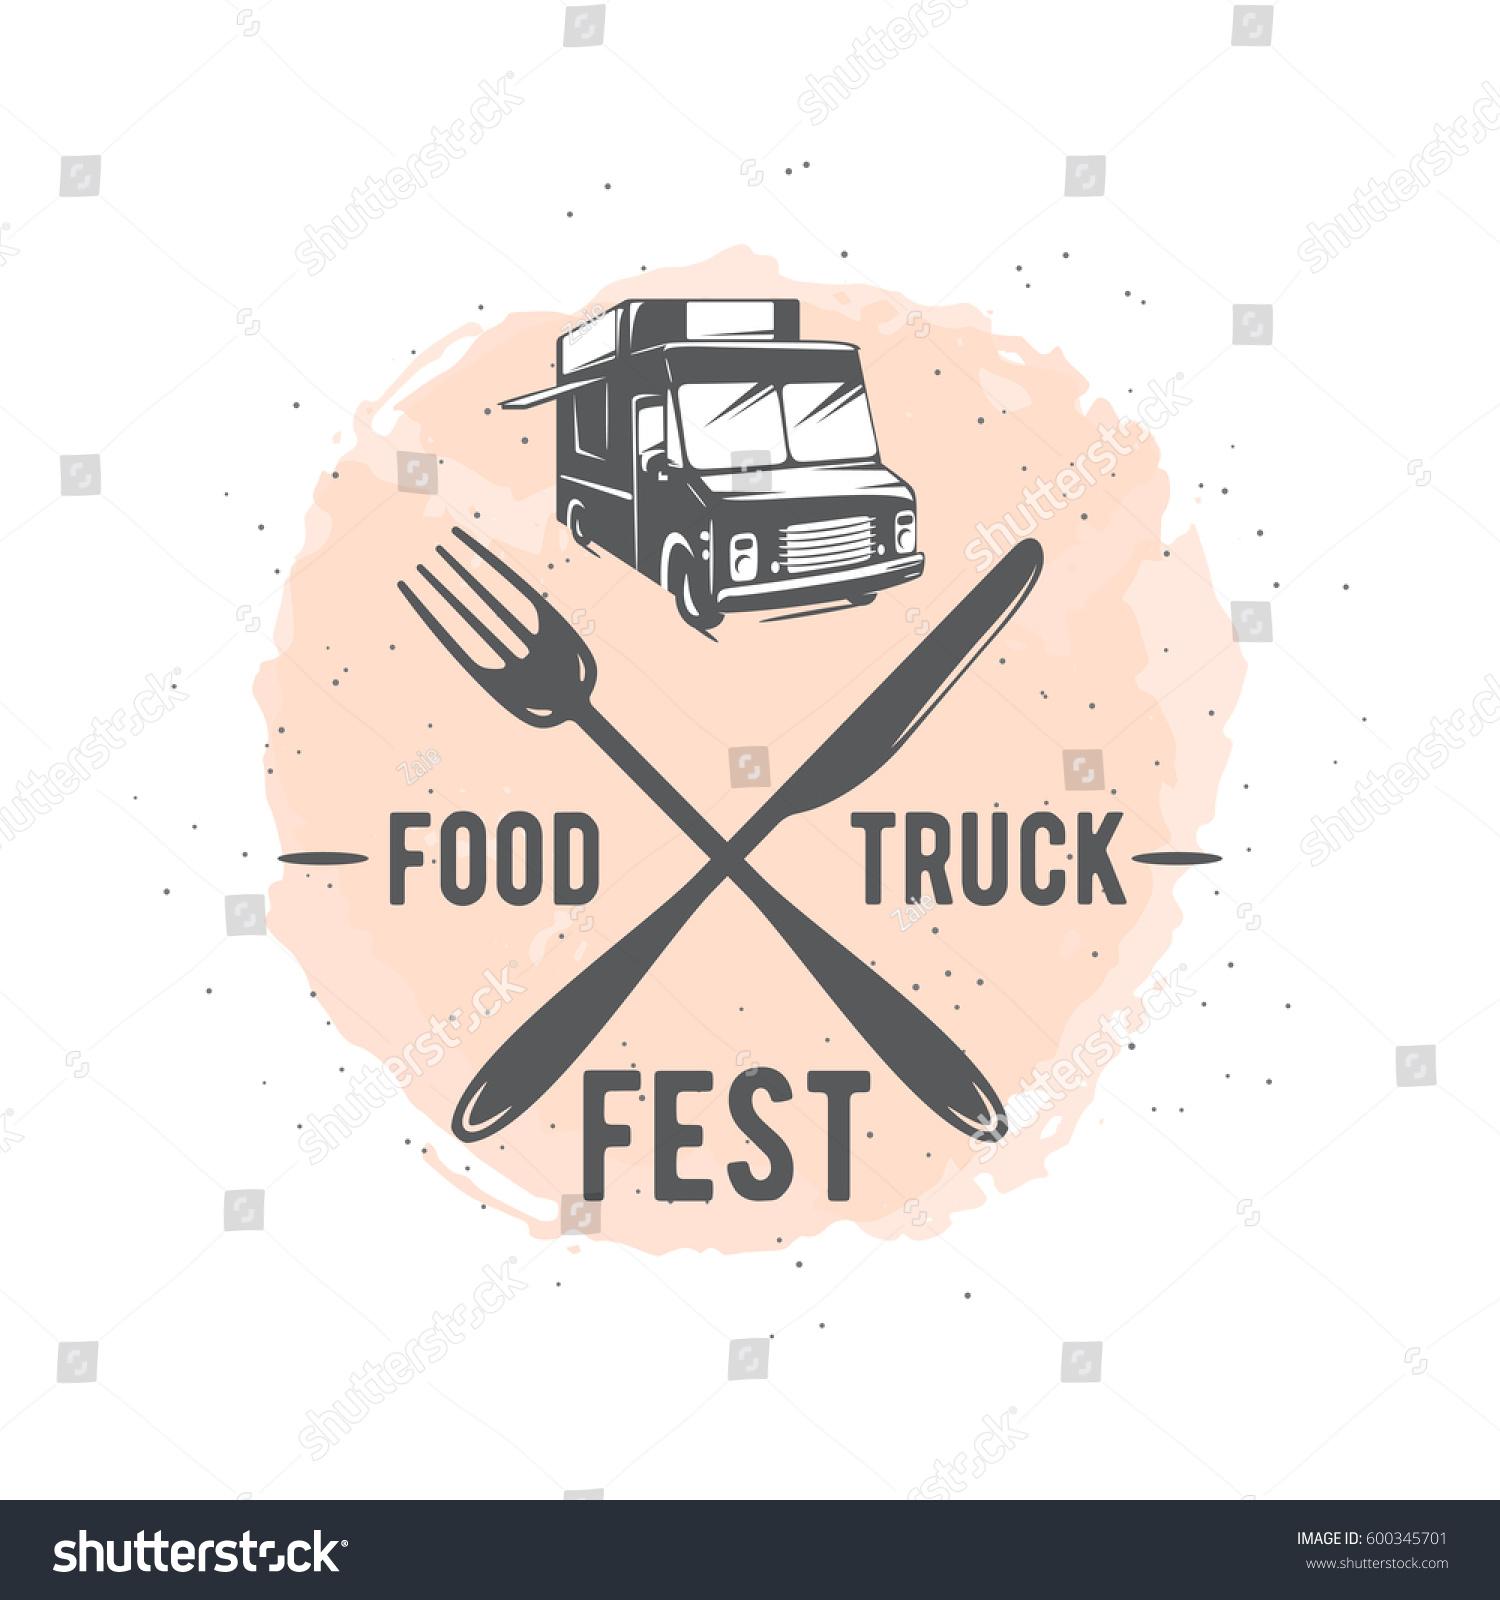 Vector Illustration Street Food Truck Graphic Stock Vector